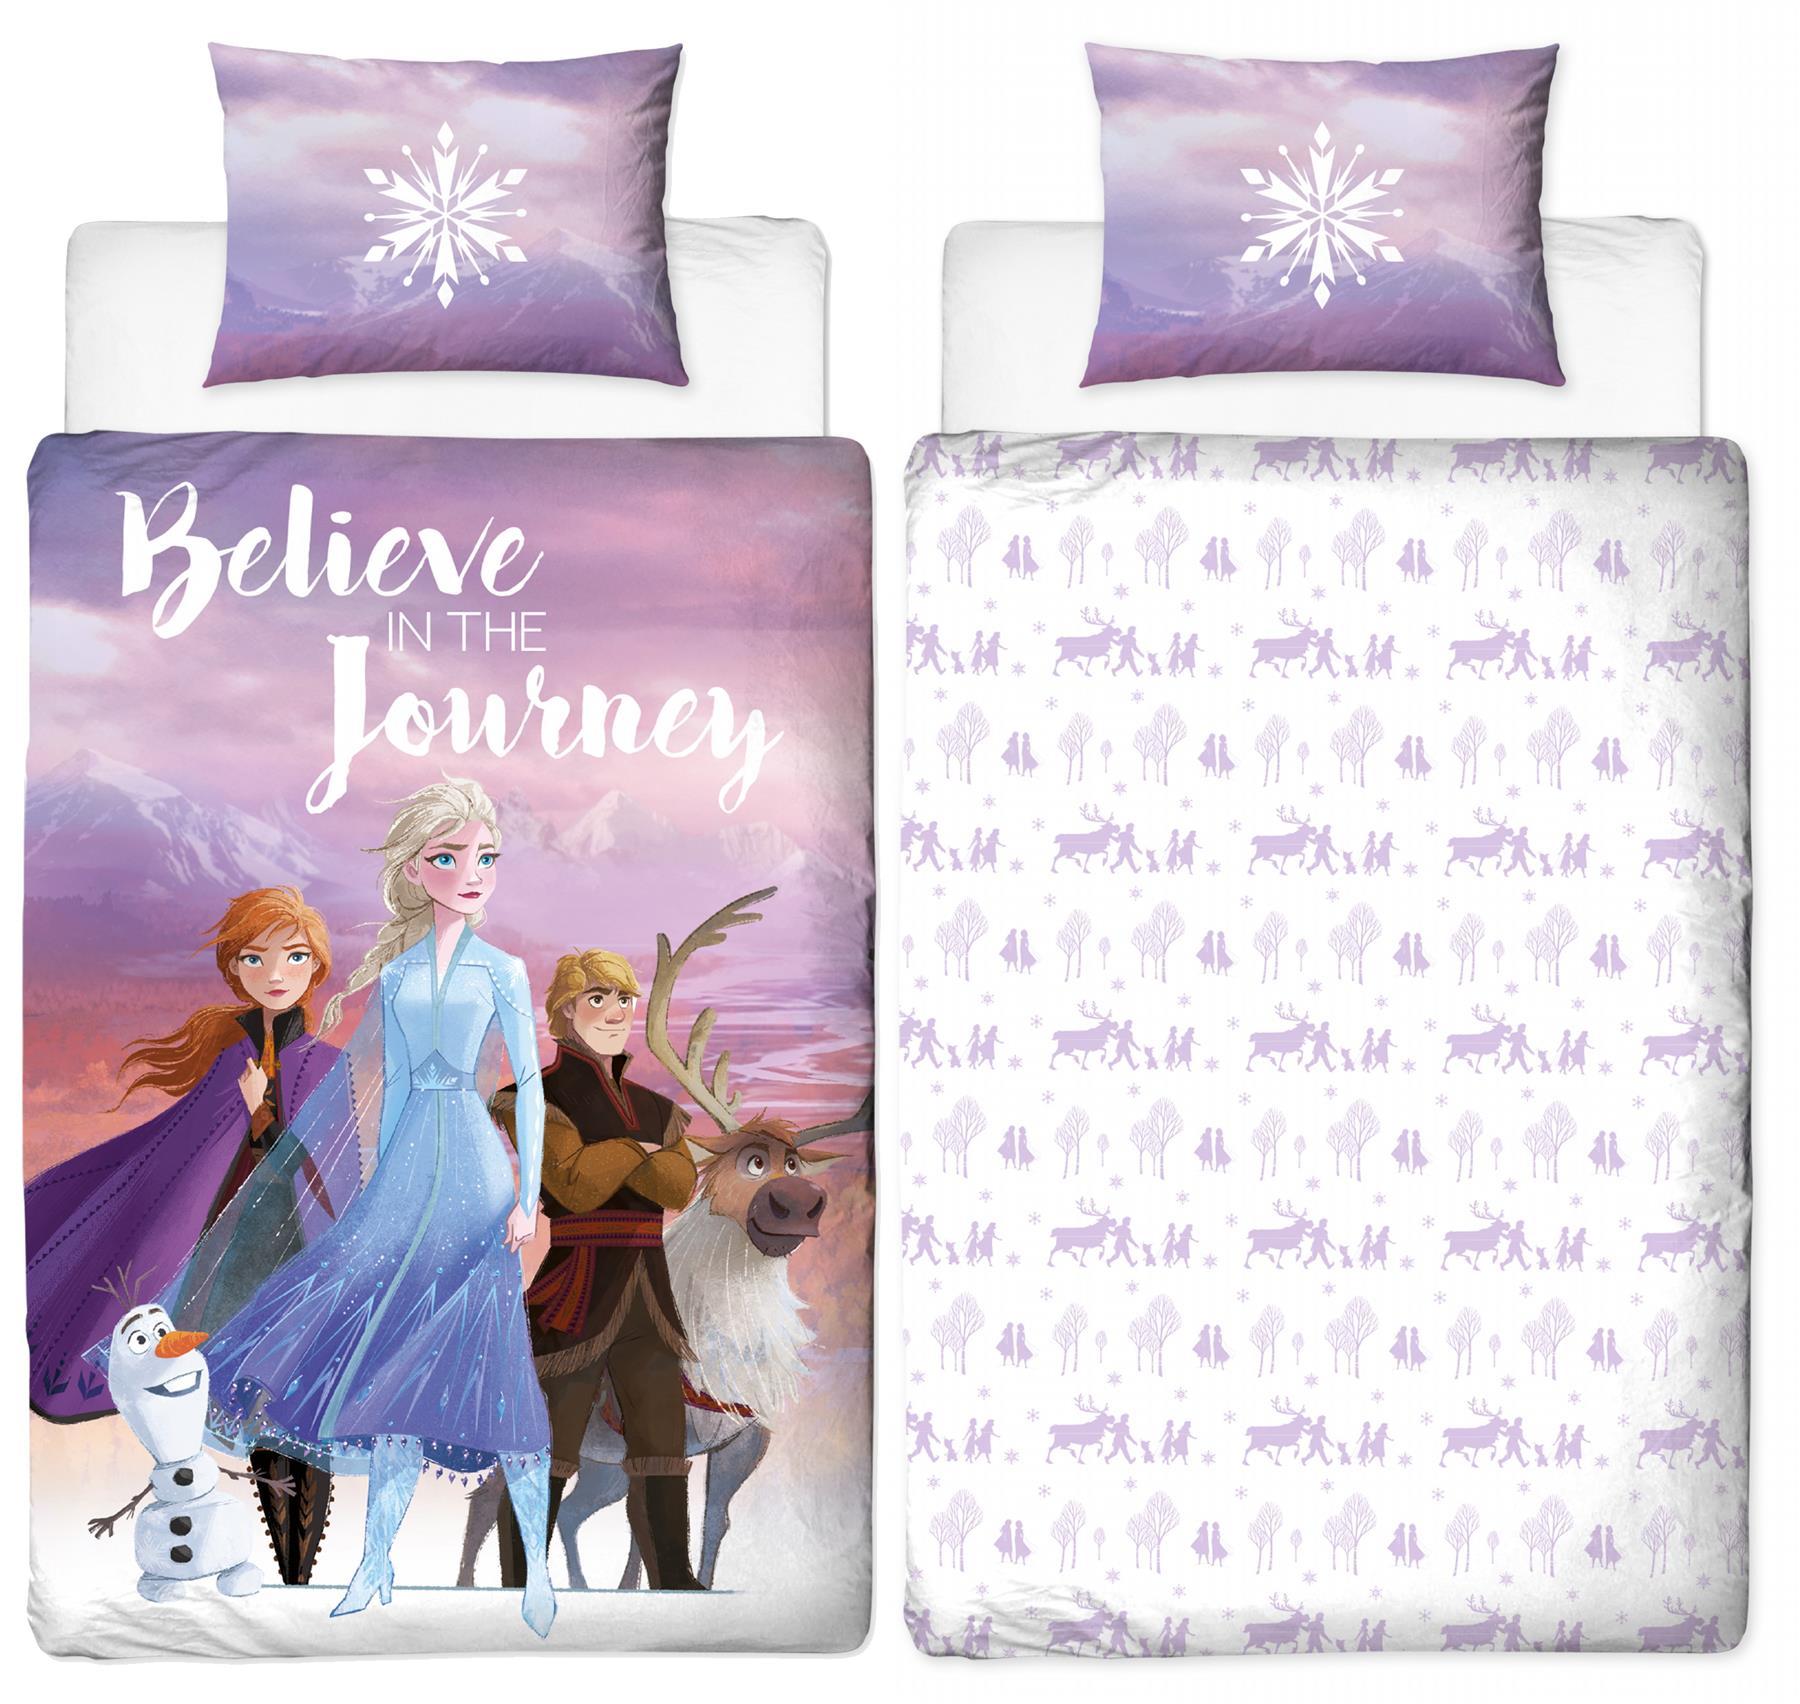 Official-Frozen-2-Duvet-Covers-Single-Double-Reversible-Bedding-Elsa-Anna-Olaf thumbnail 15